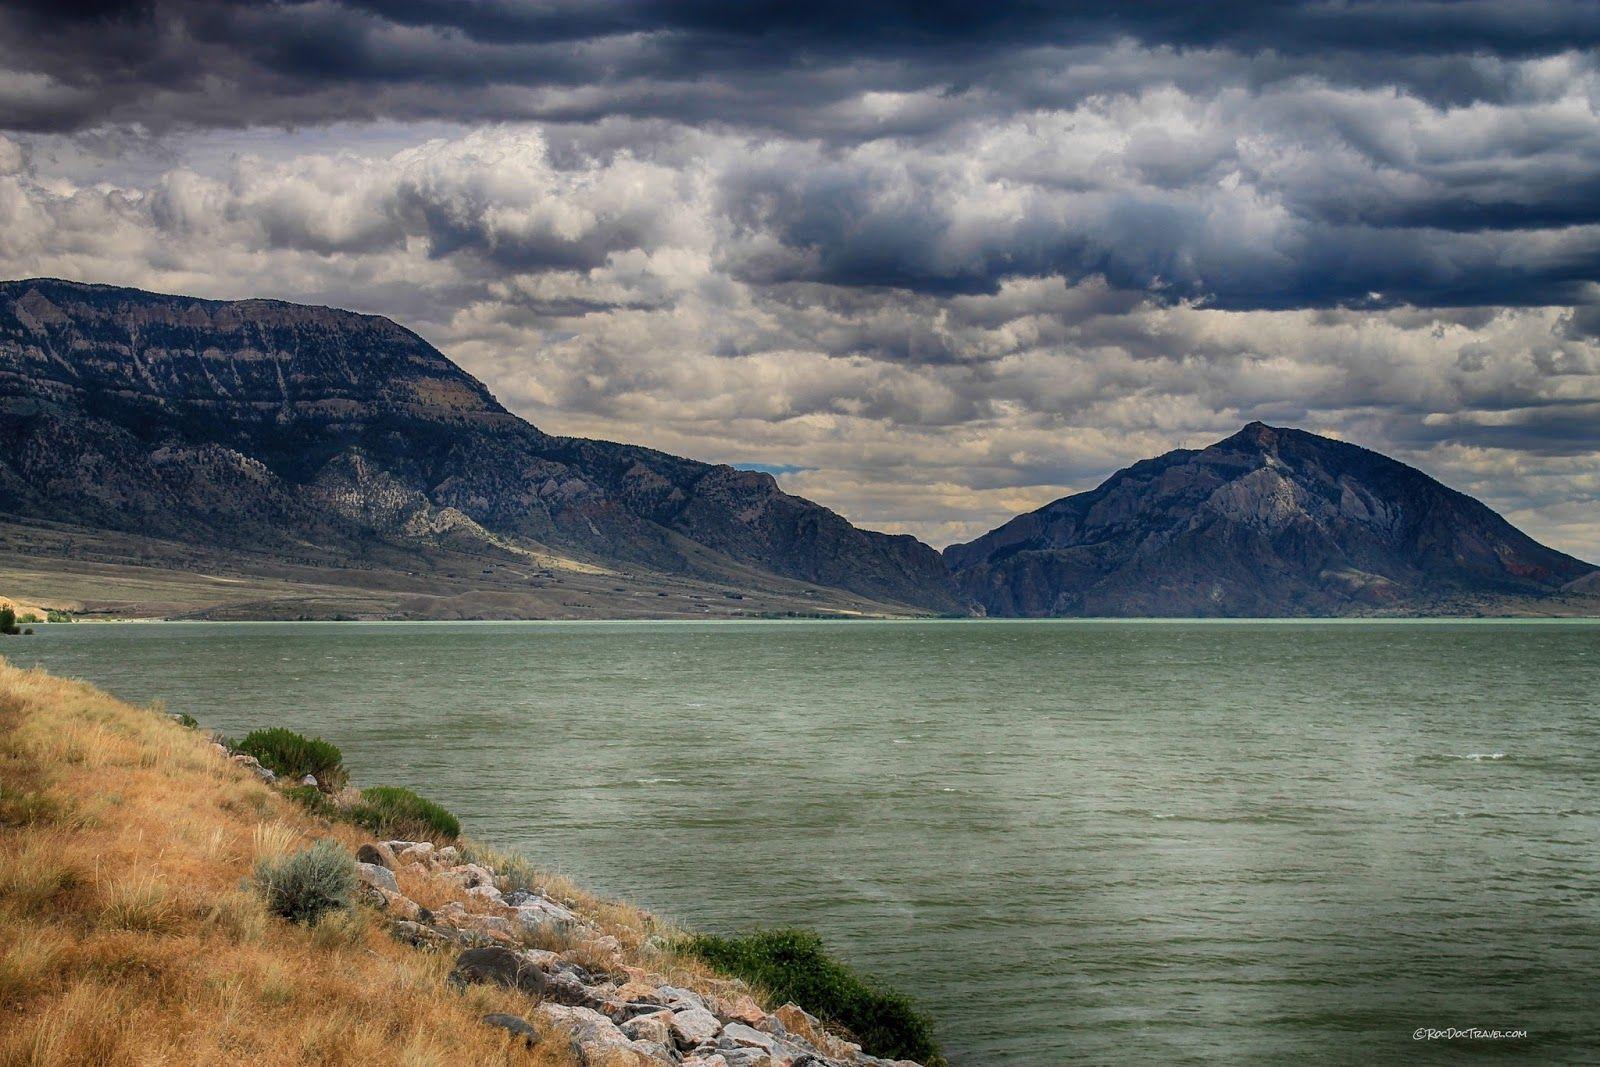 Rattlesnake Mountain and Buffalo Bill Reservoir, Wyoming